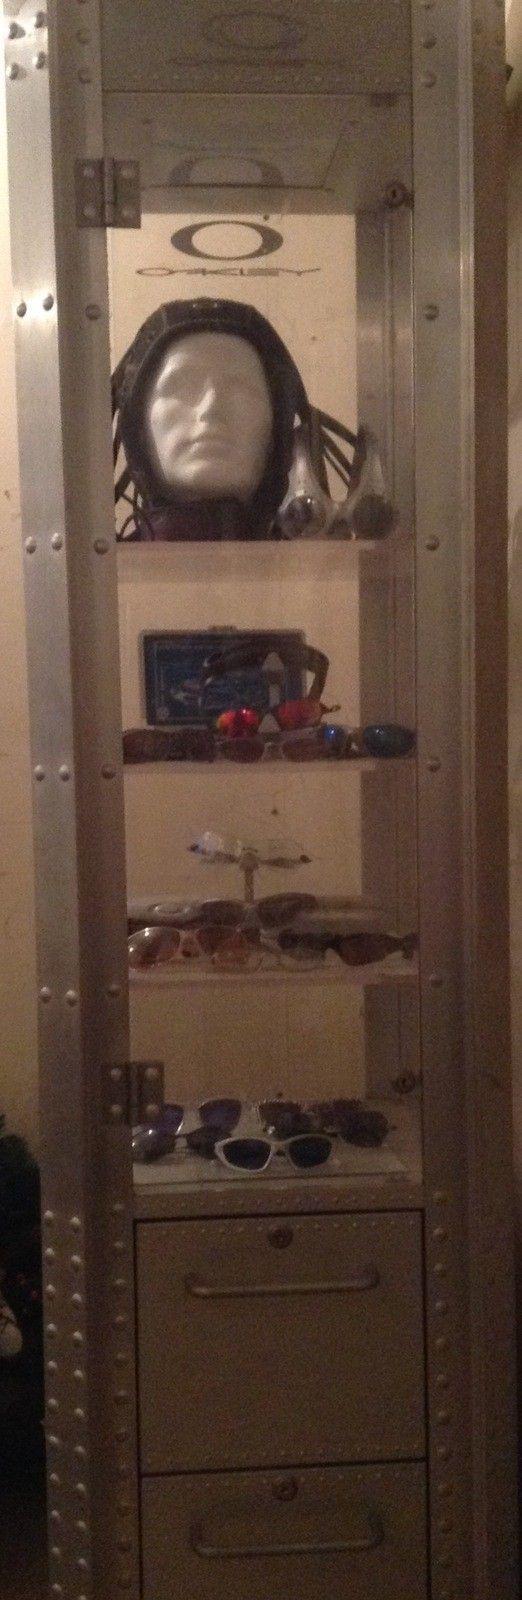 Single mega cabinet - image.jpeg